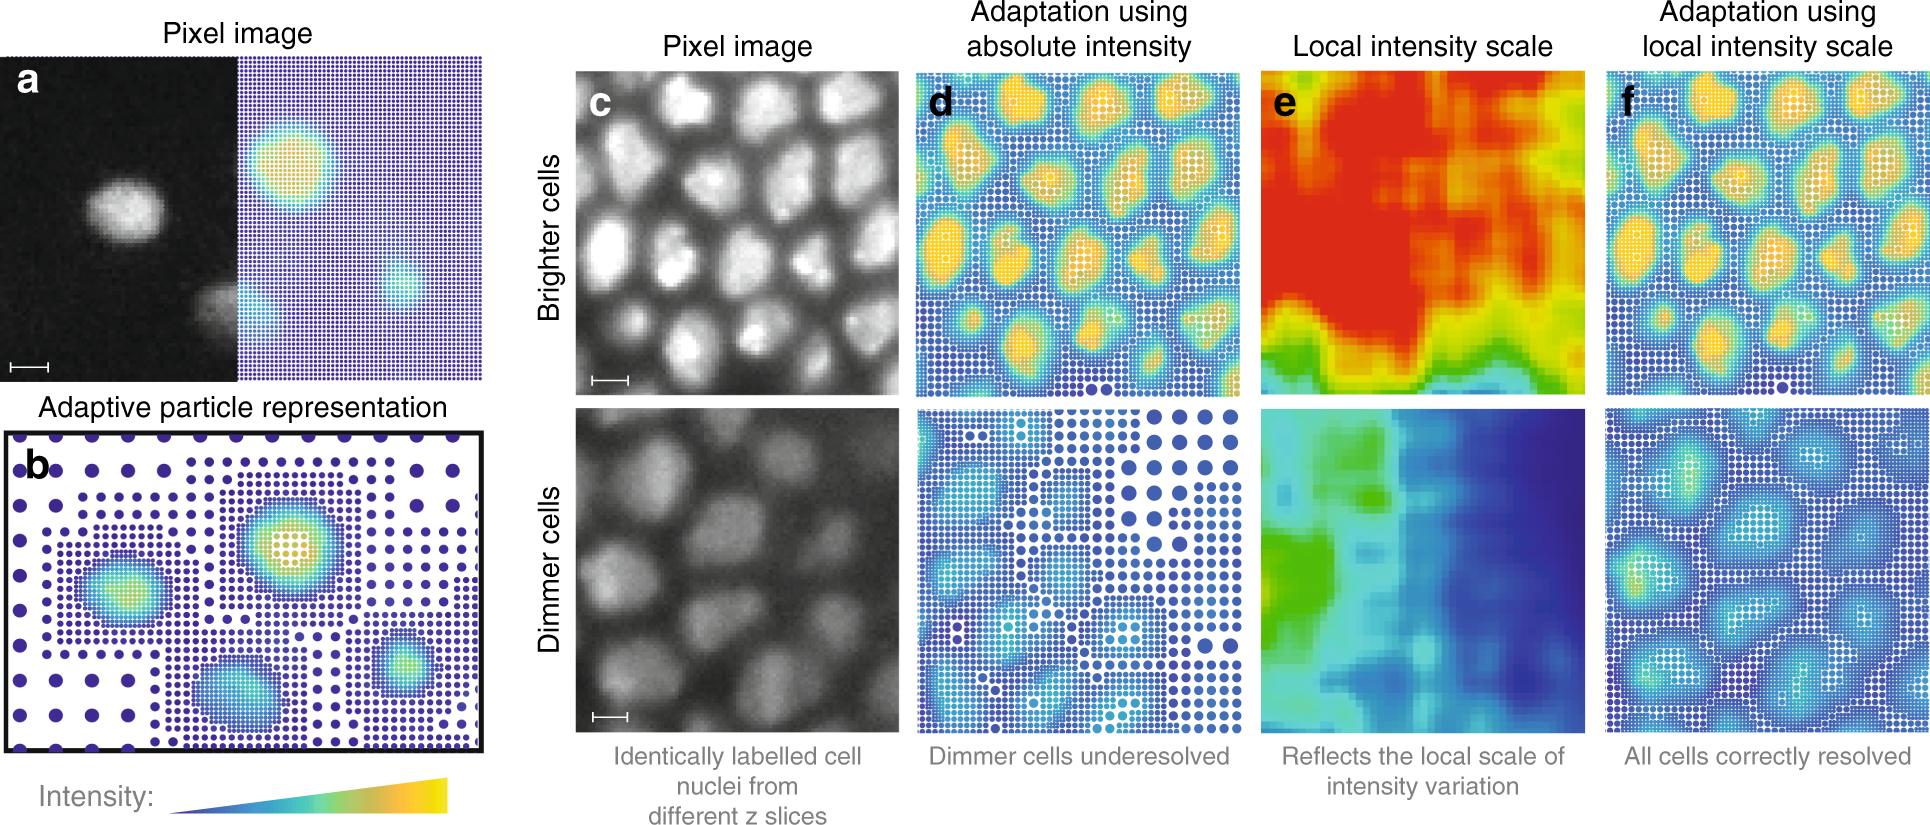 Adaptive particle representation of fluorescence microscopy